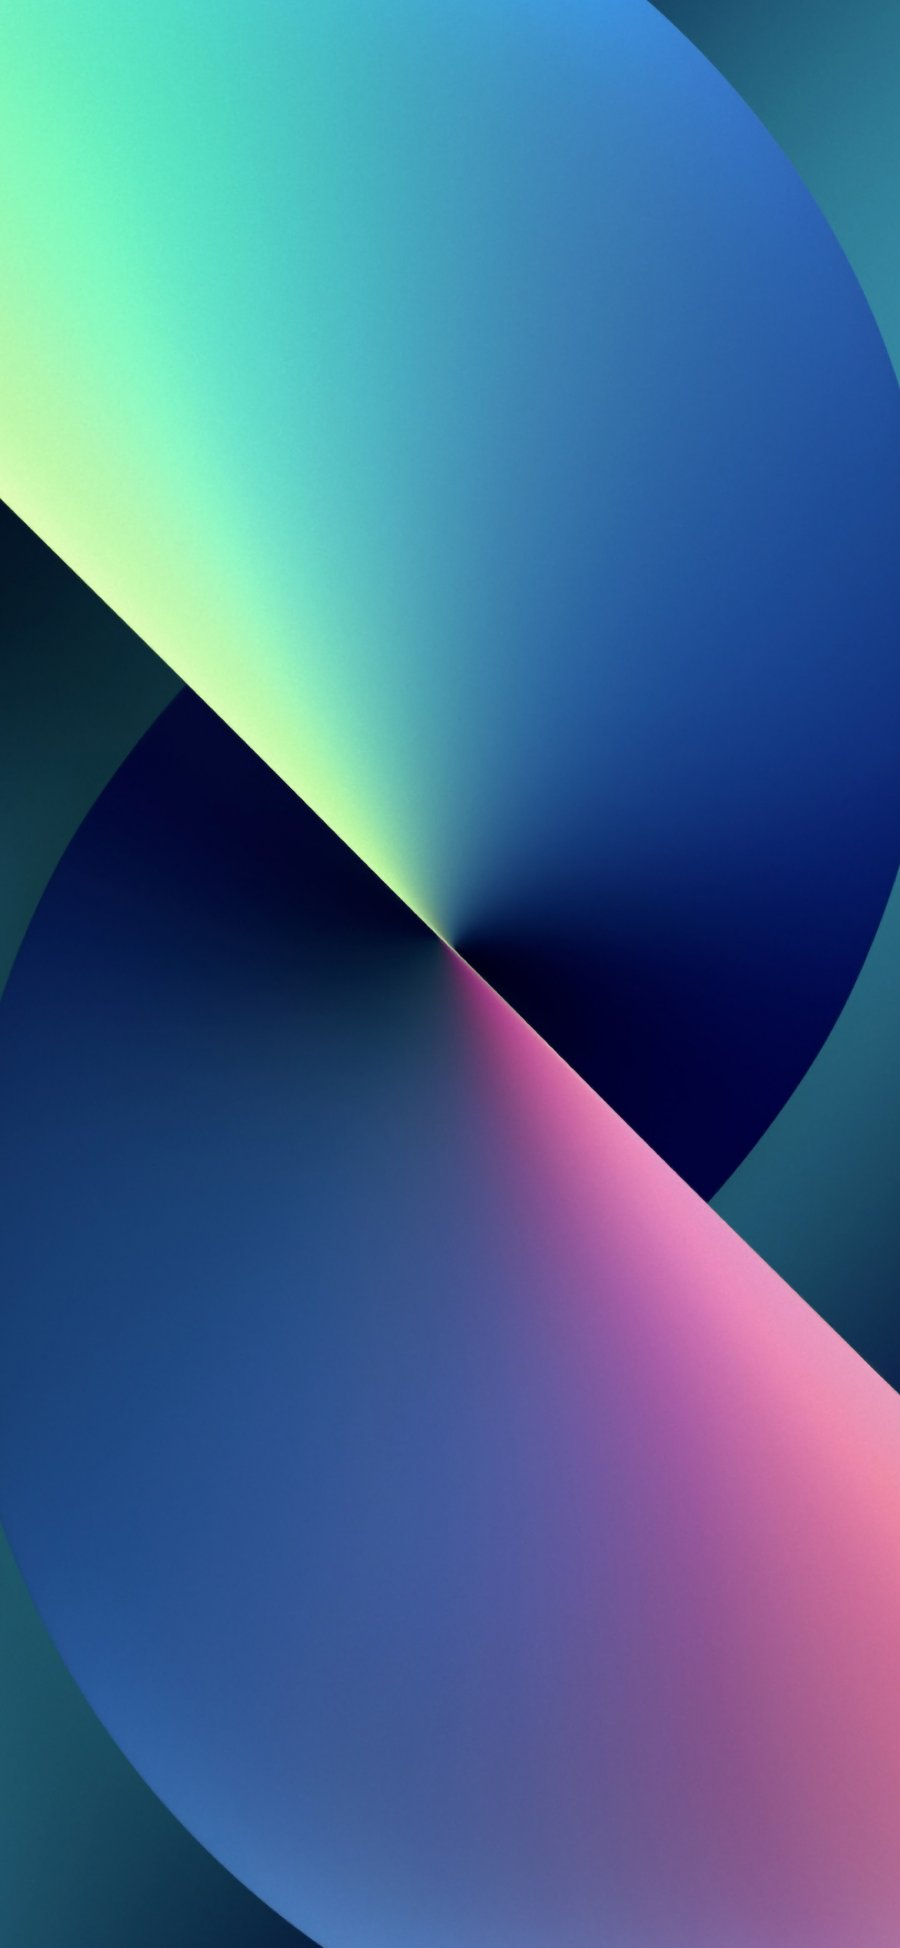 iPhone 13 wallpaper multi color